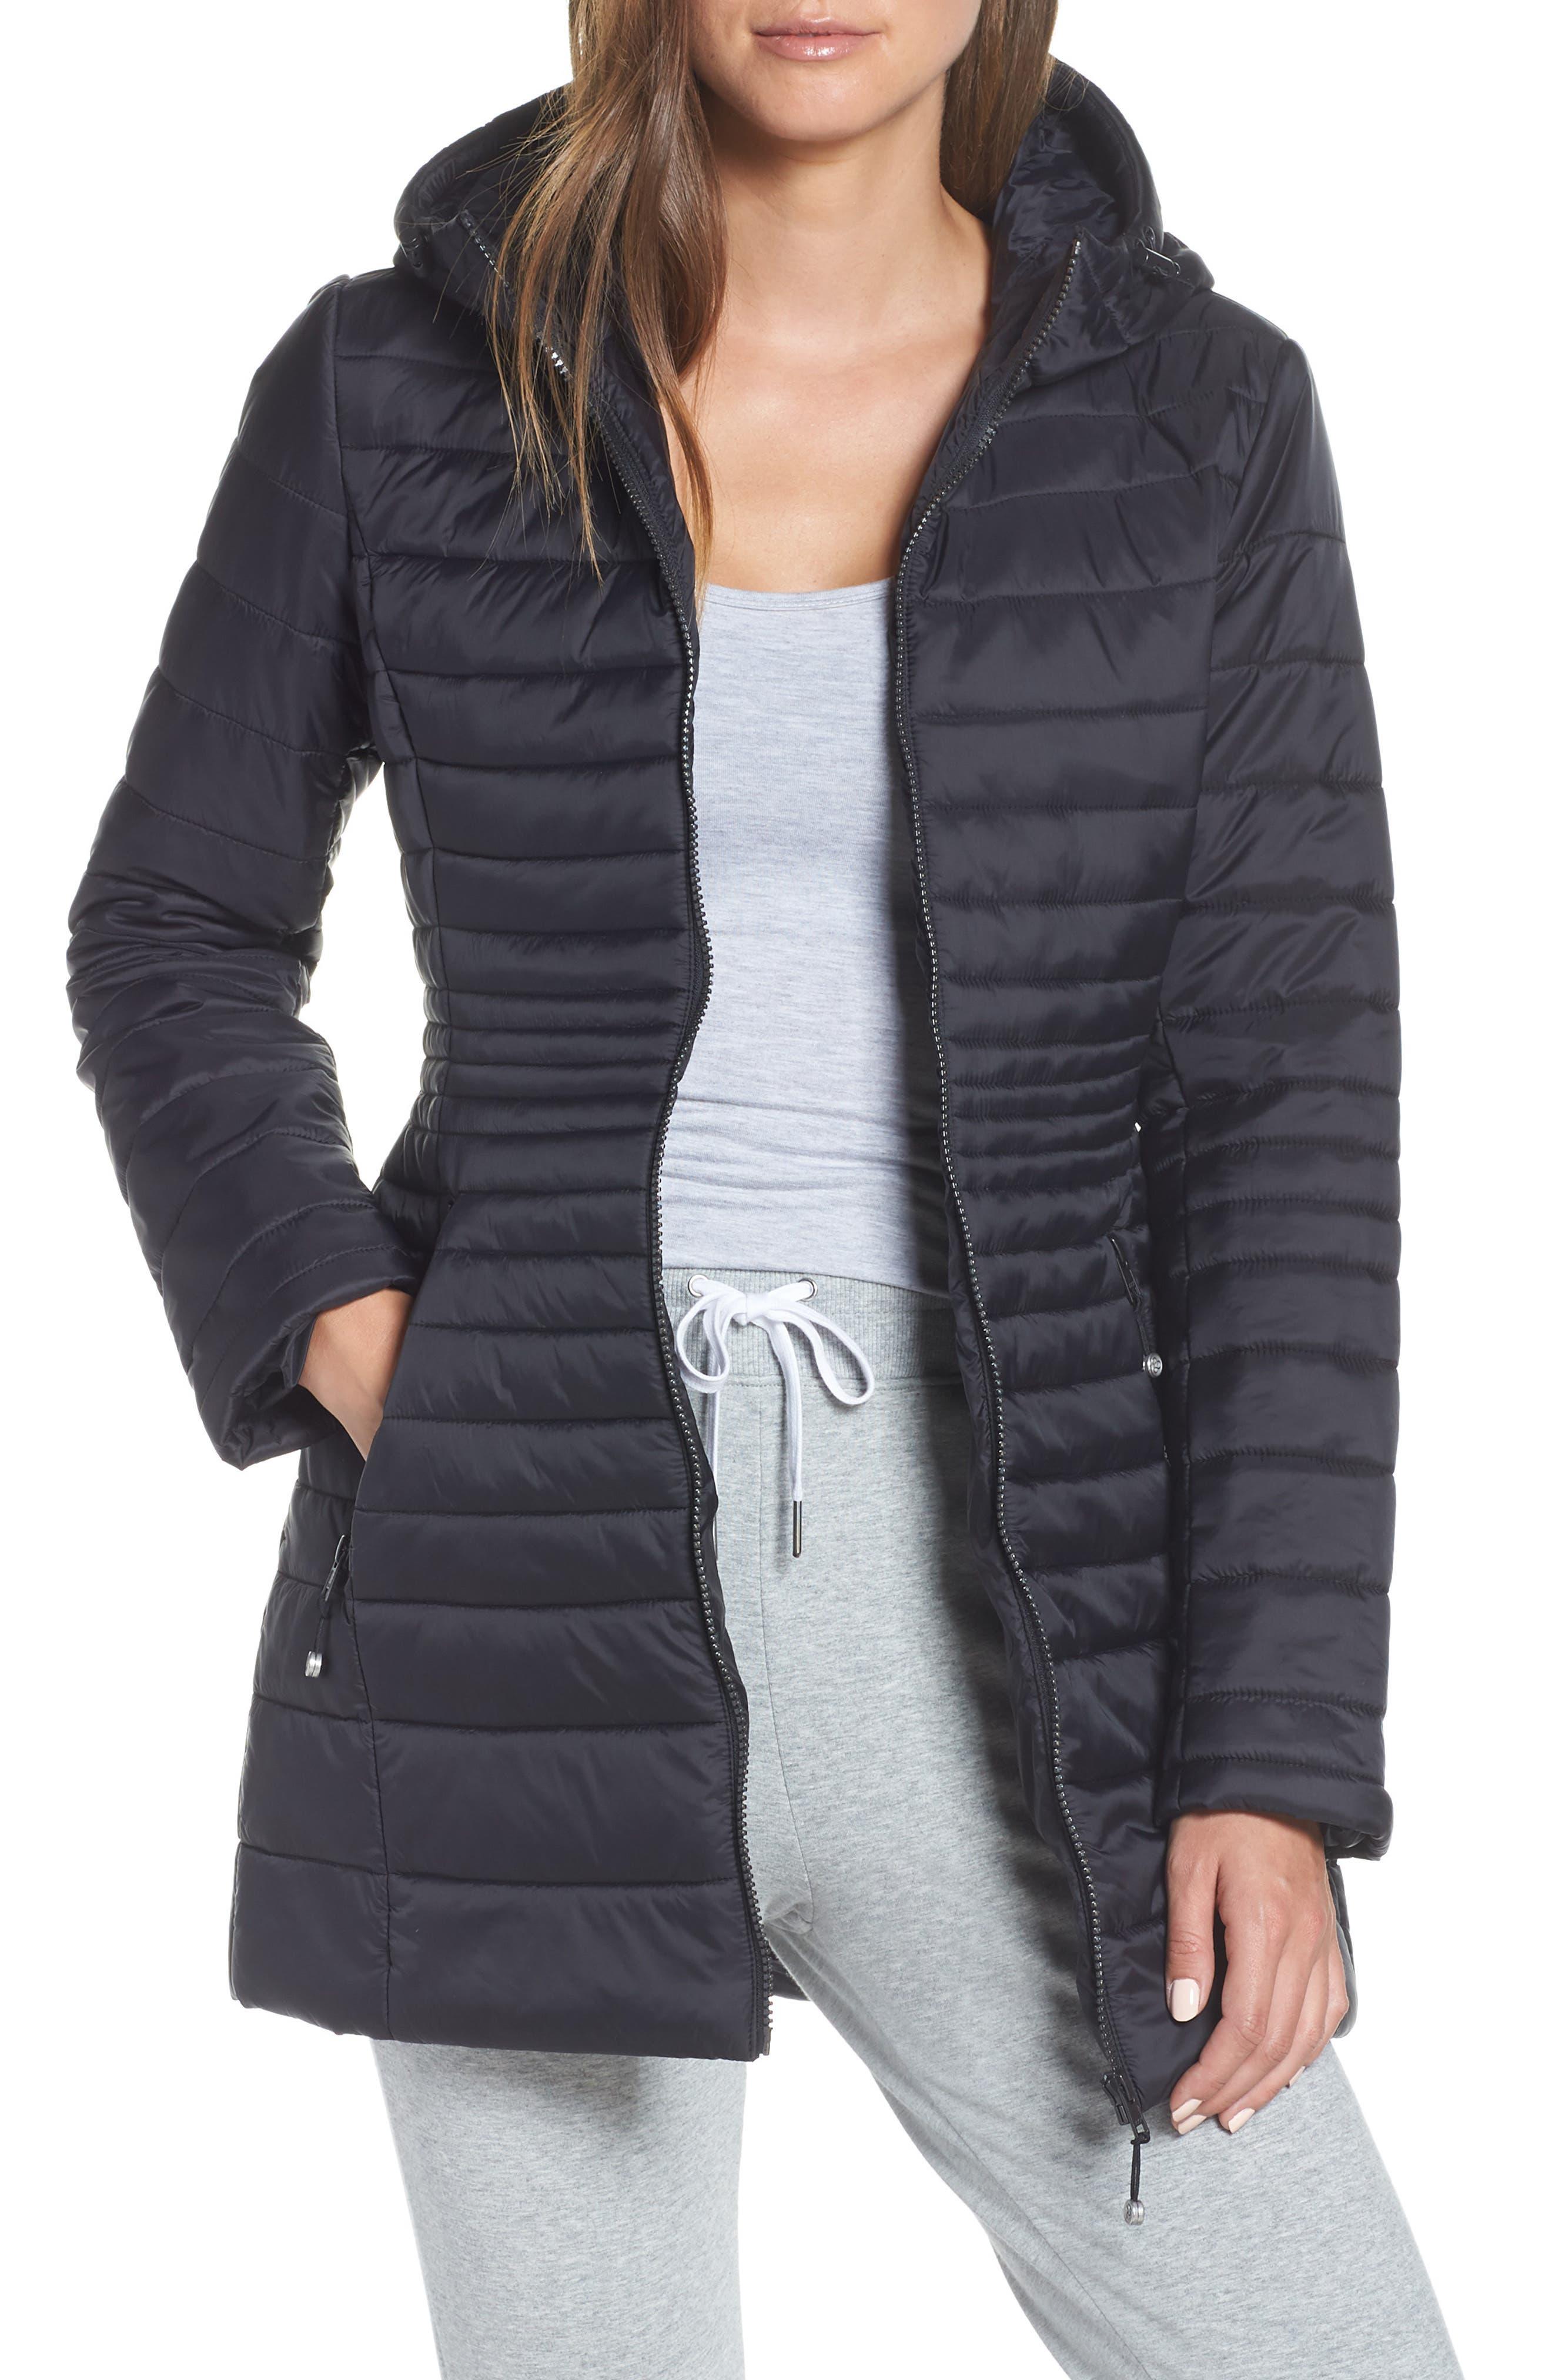 ZELLA, City Dweller Water Resistant Puffer Jacket, Main thumbnail 1, color, 001